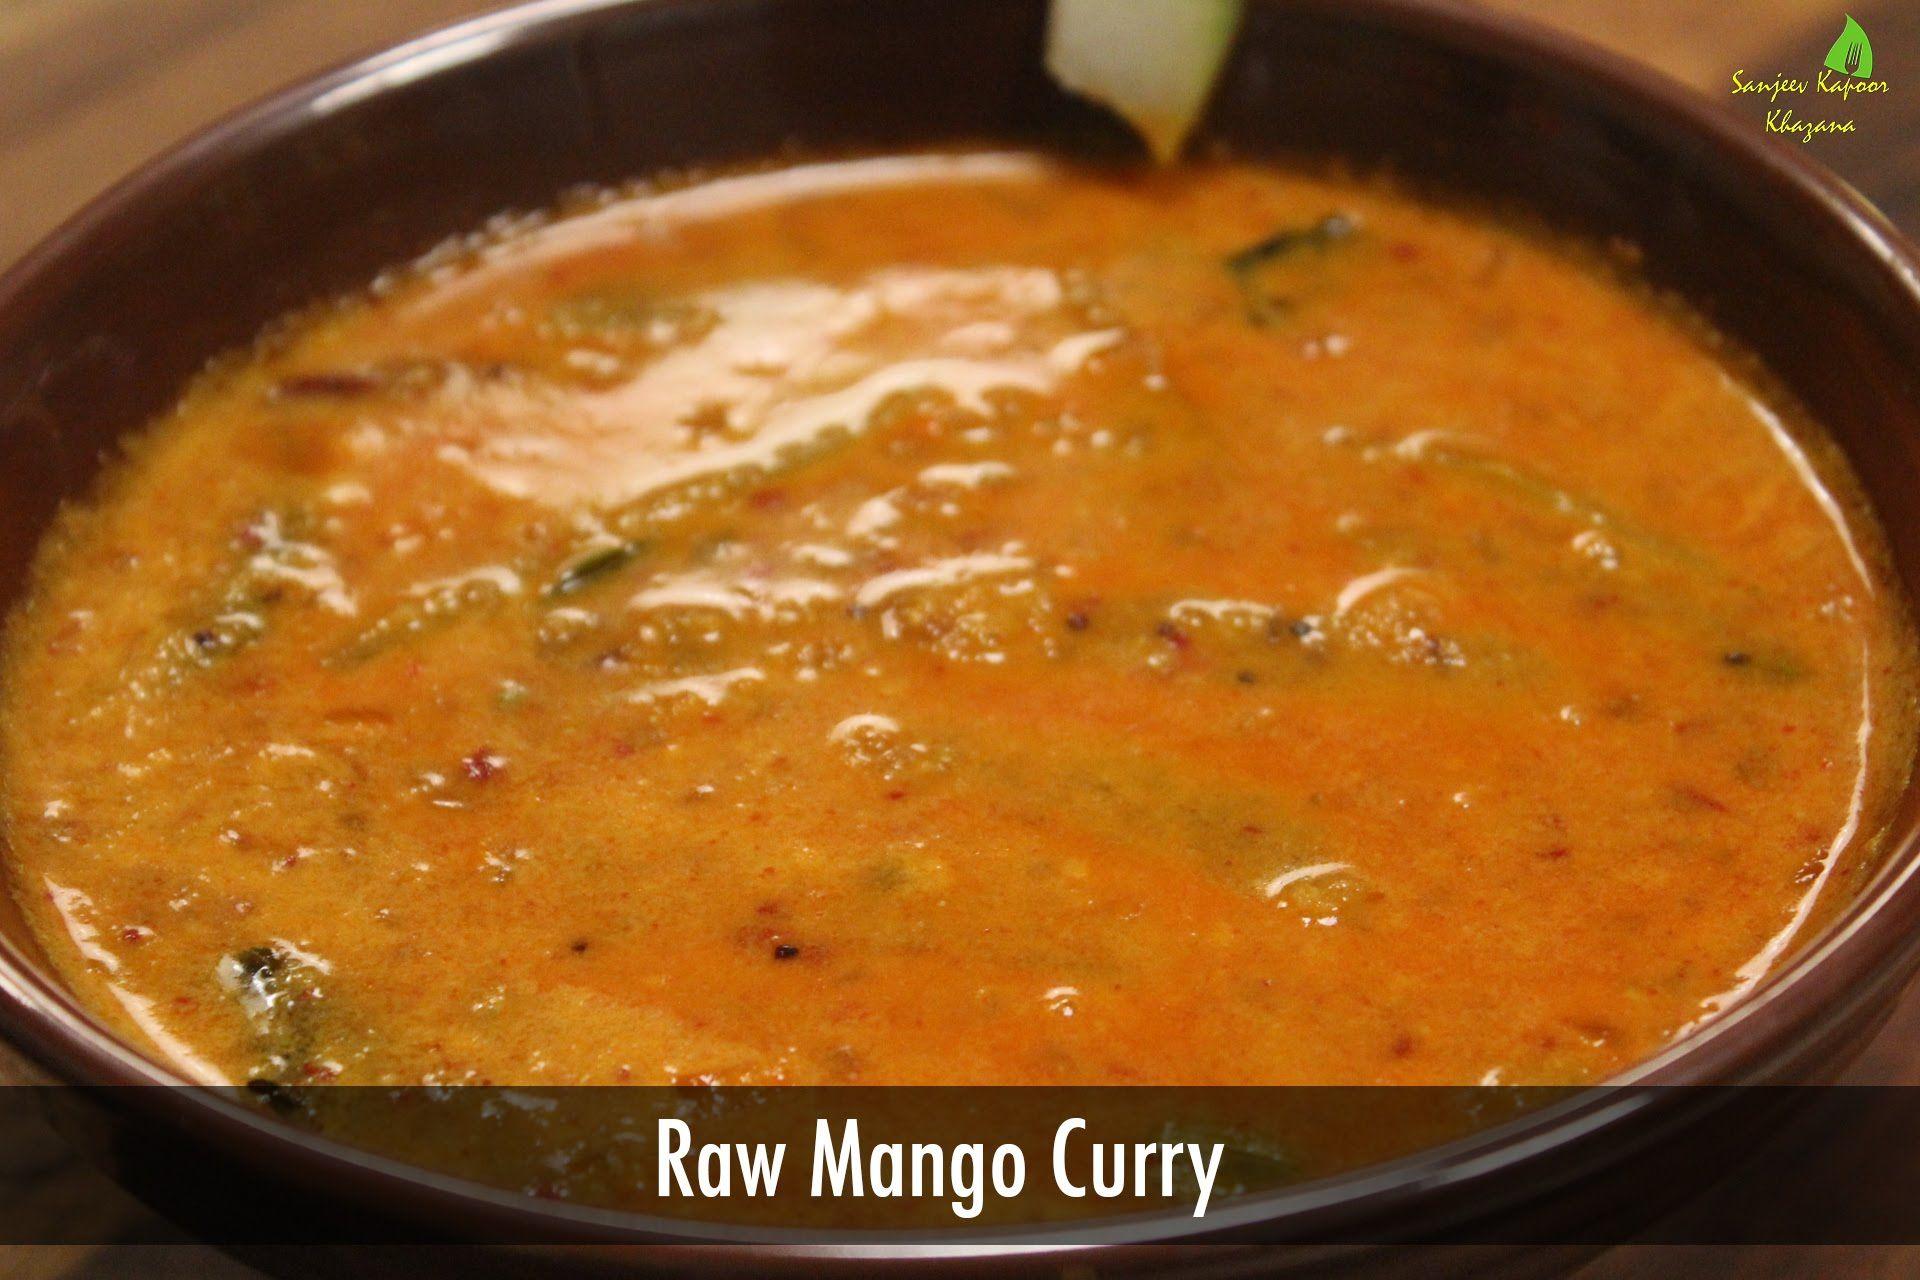 Raw mango curry konkan recipes sanjeev kapoors khana khazana raw mango curry konkan recipes sanjeev kapoors khana khazana forumfinder Choice Image